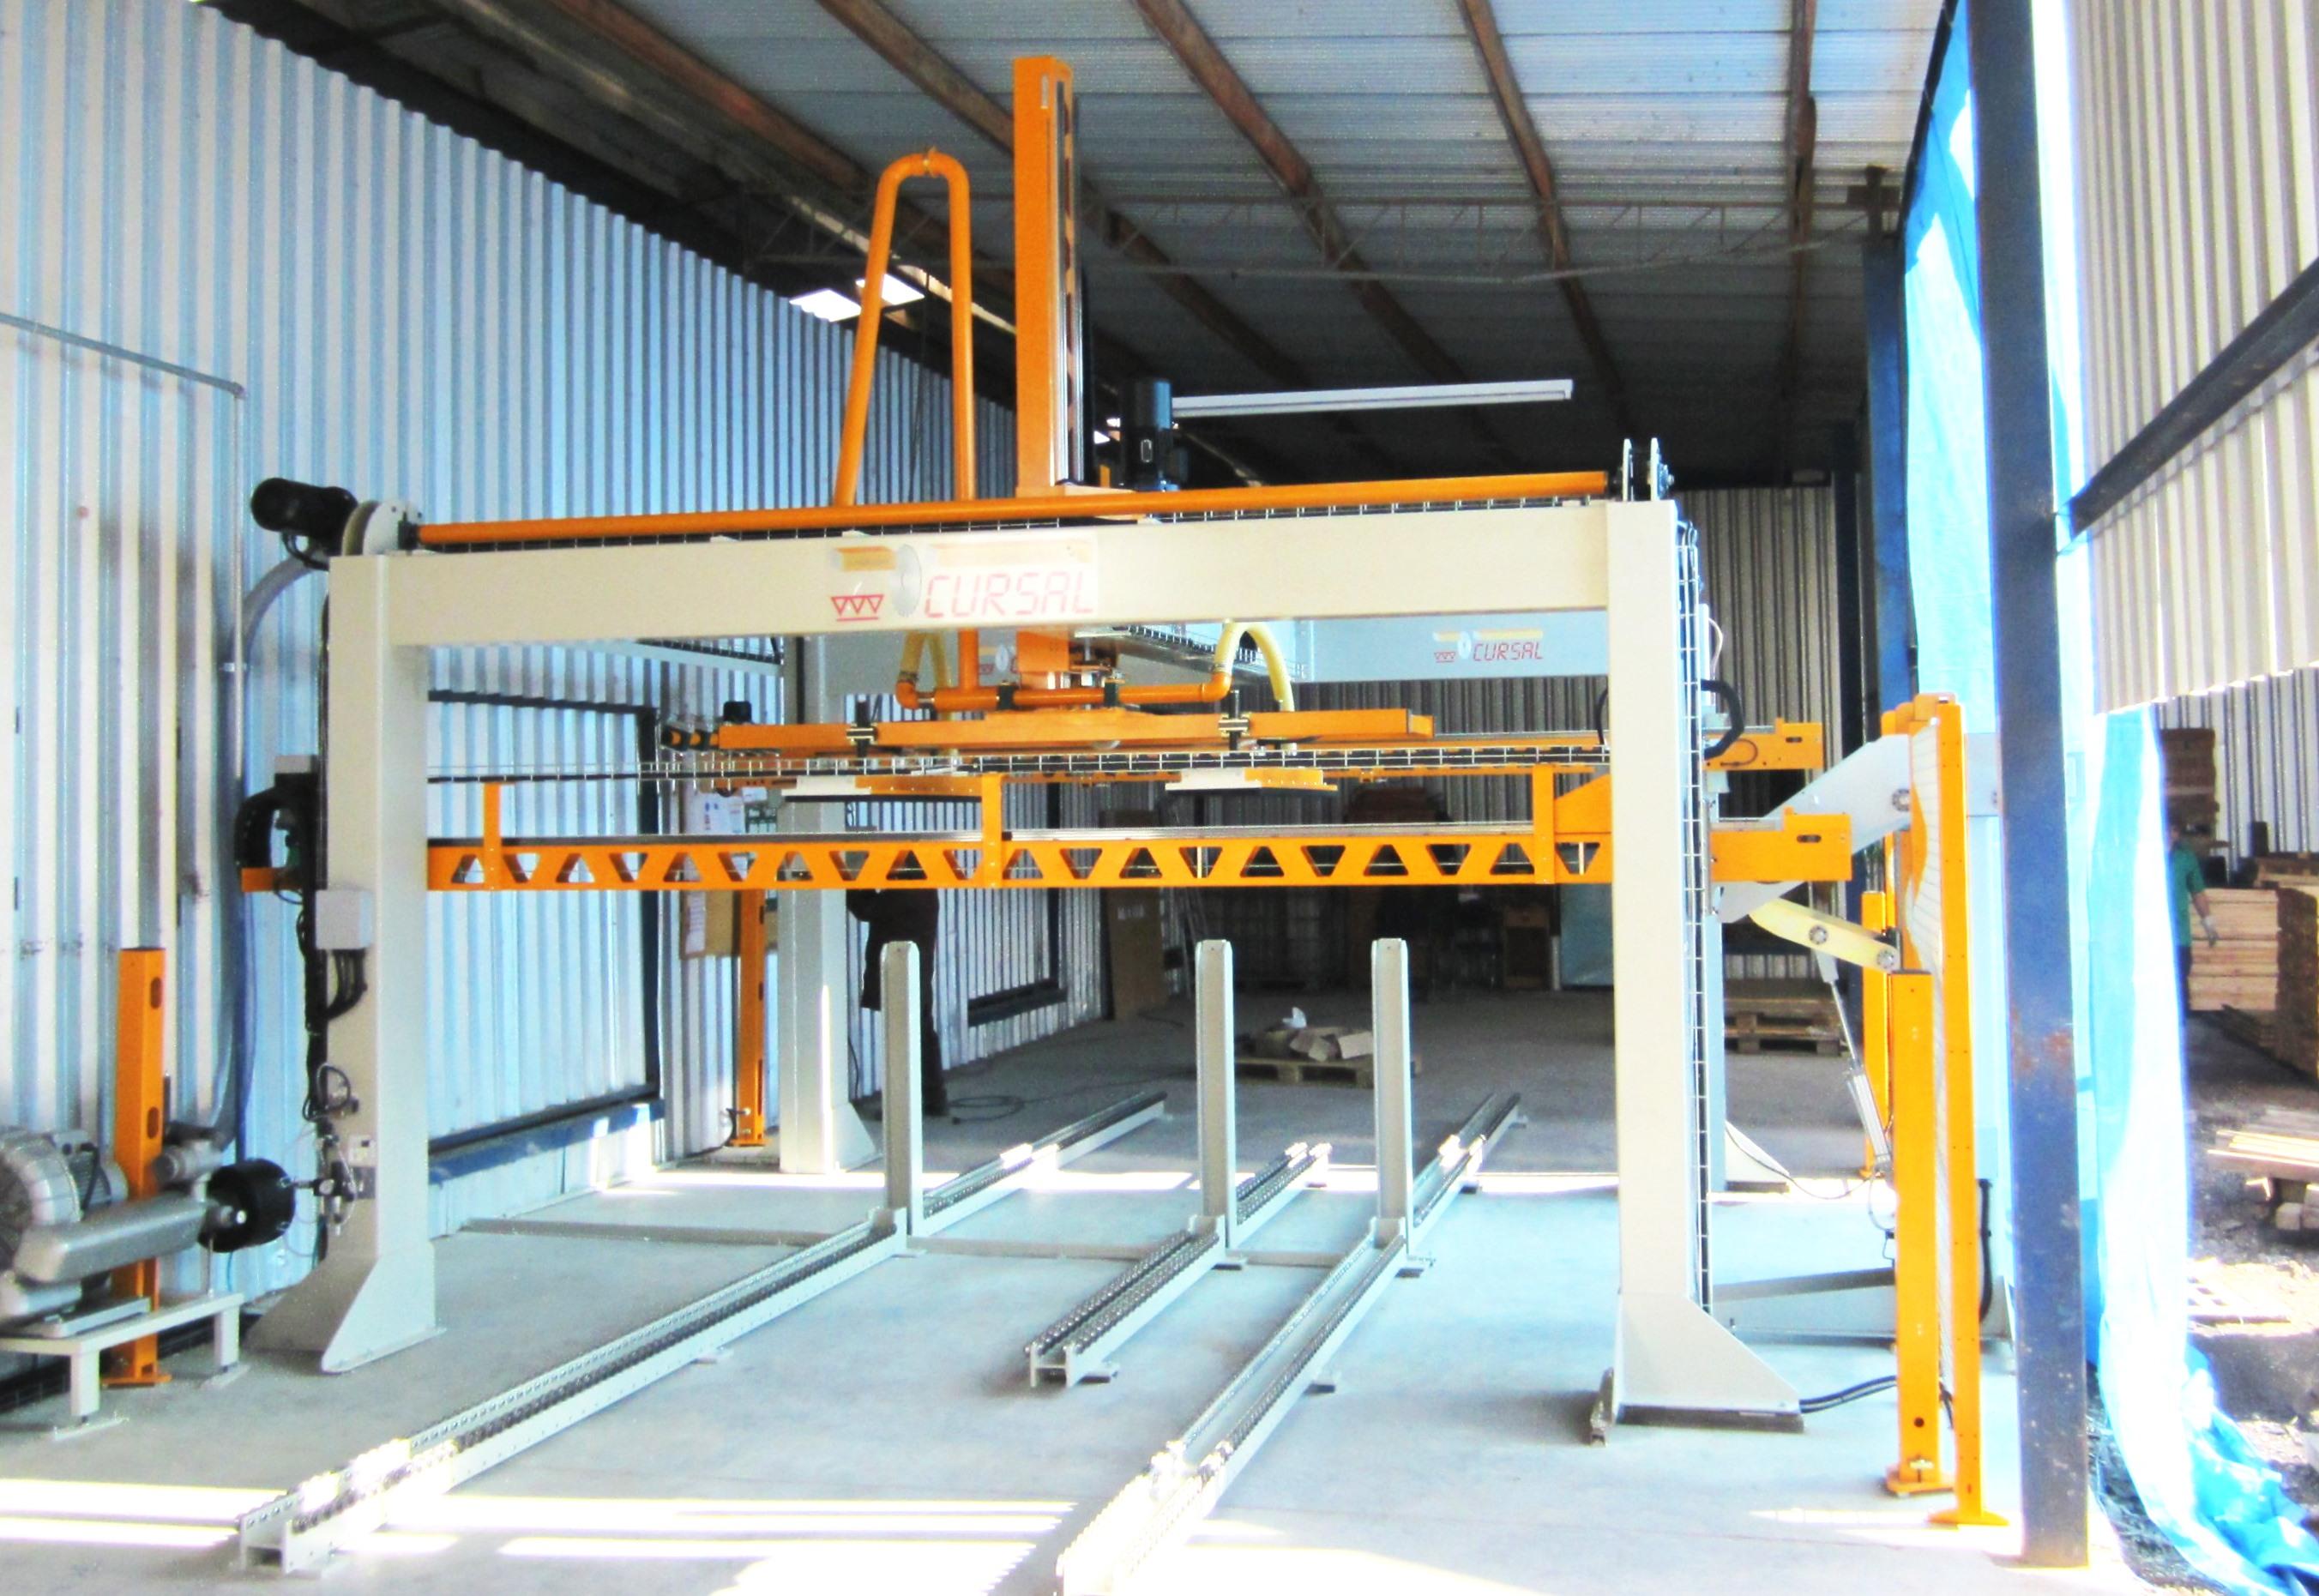 loaders-unloaders-vacuums-systems-4c-09